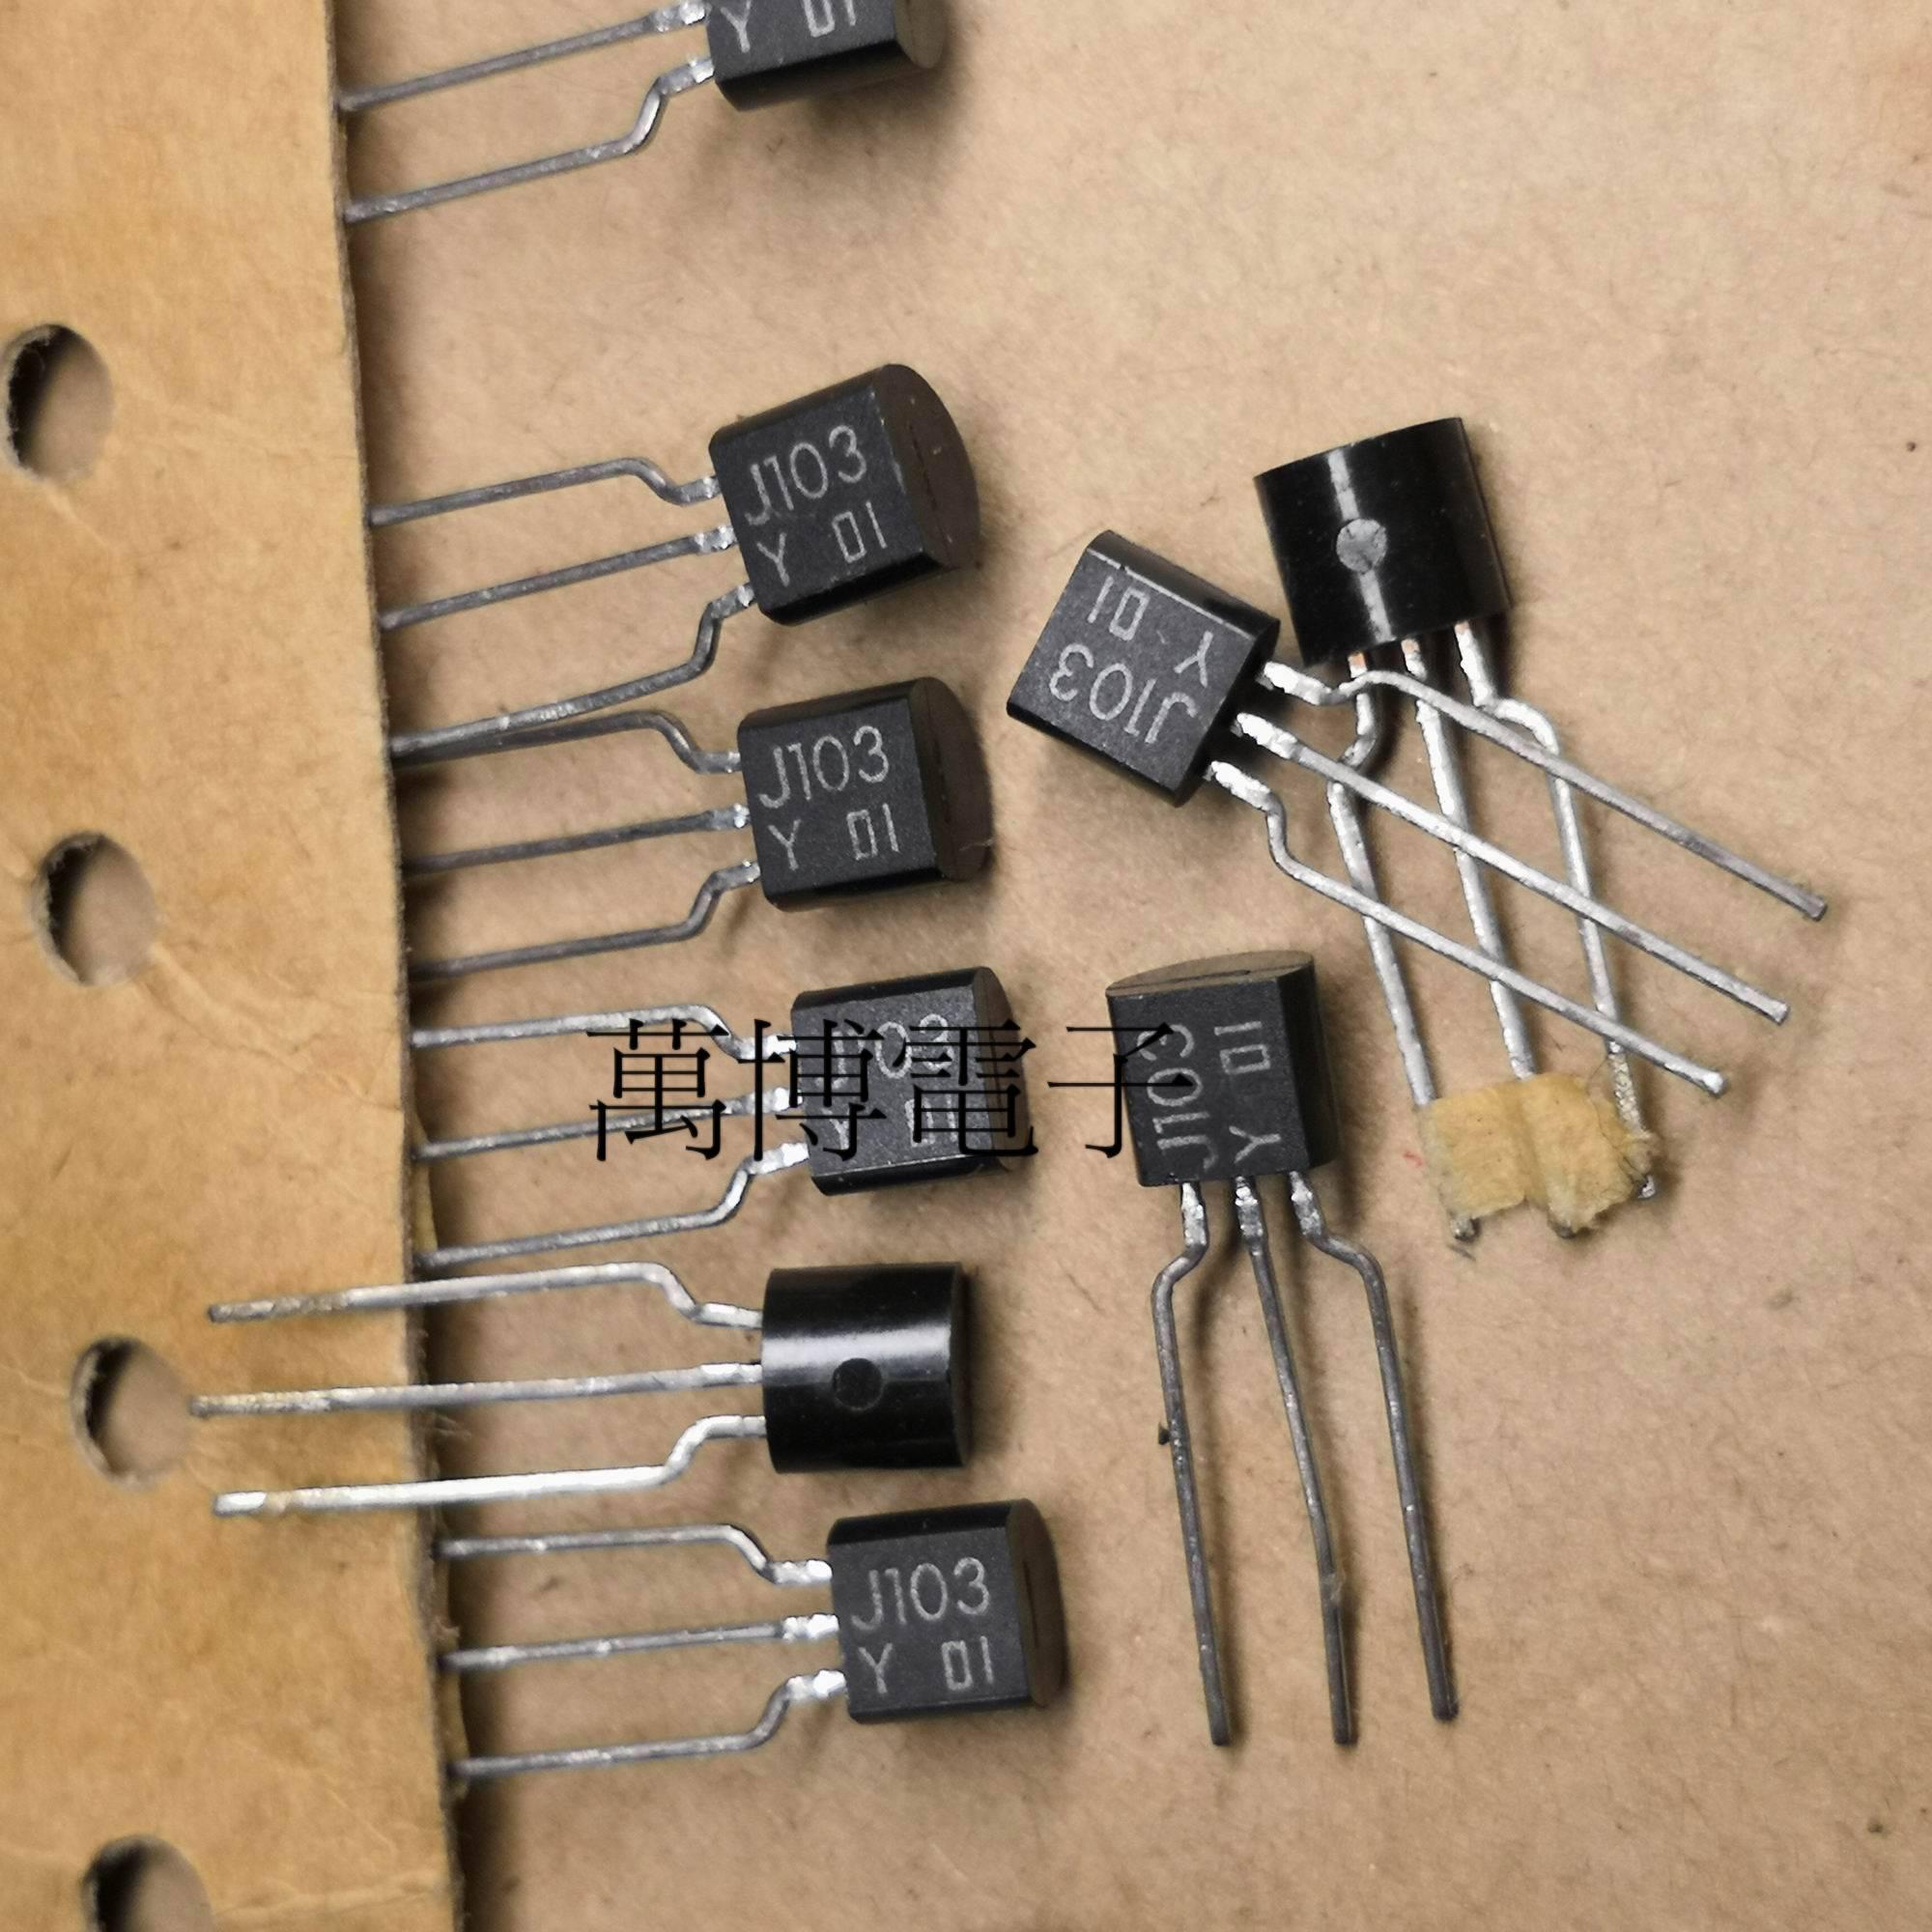 10pcs 2SJ103GR /& 10pcs 2SK246GR Original Toshiba Audio FET J103 K246 Transistor